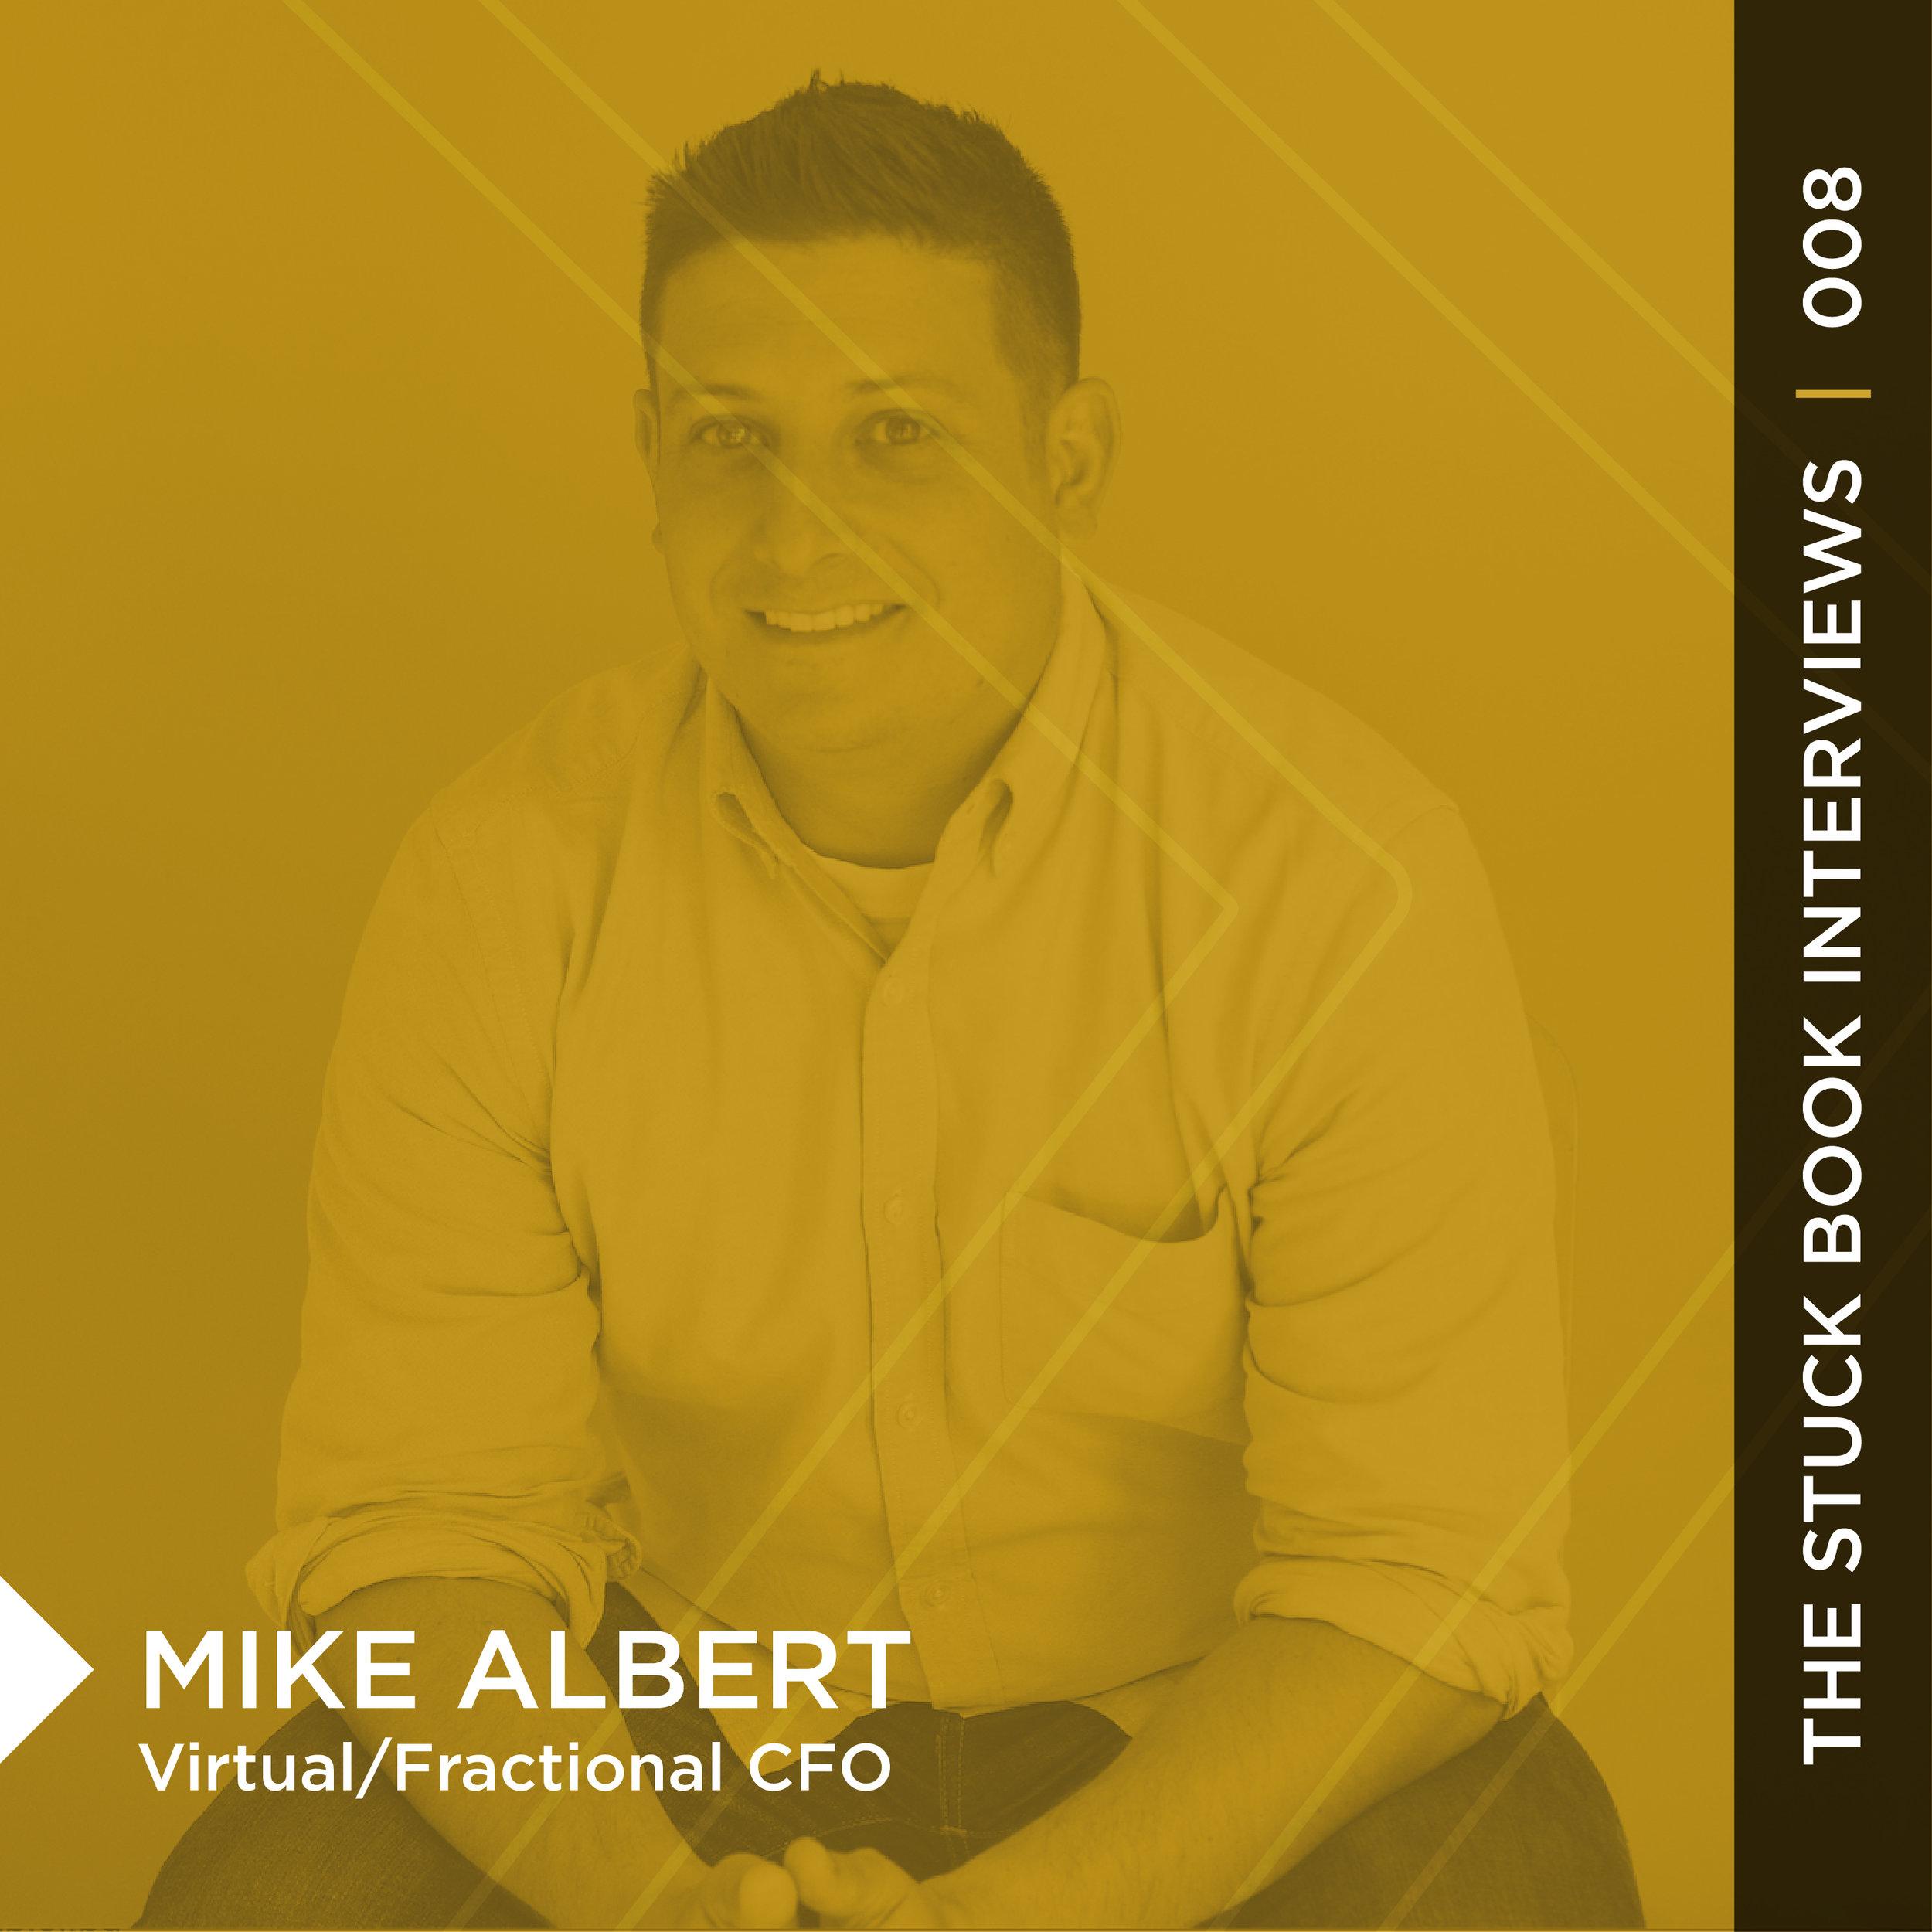 mike-albert-008-01.jpg